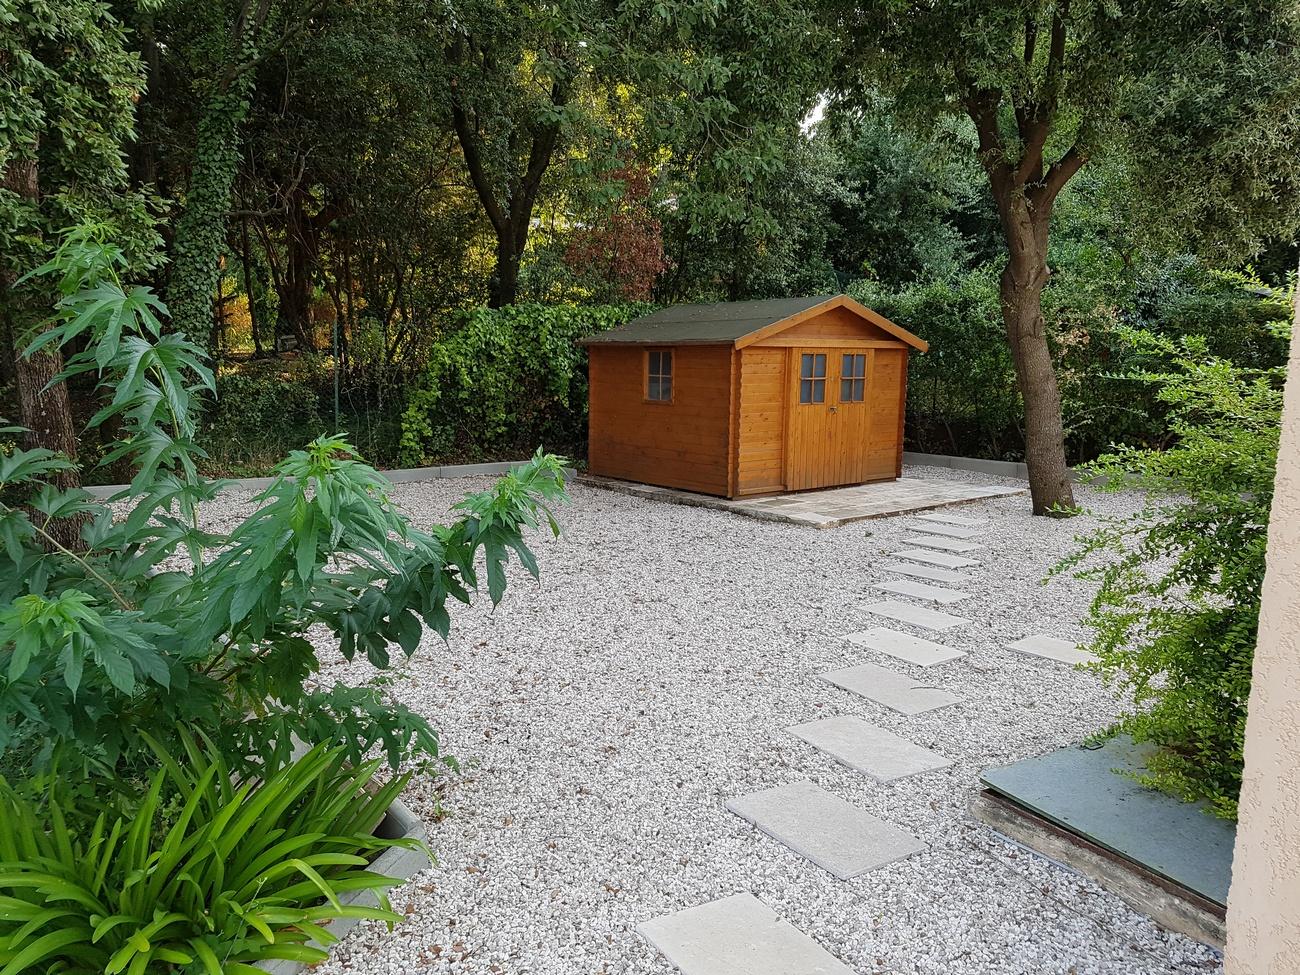 Villa rental Cote d'Azur France - Villa Valbonne private pool